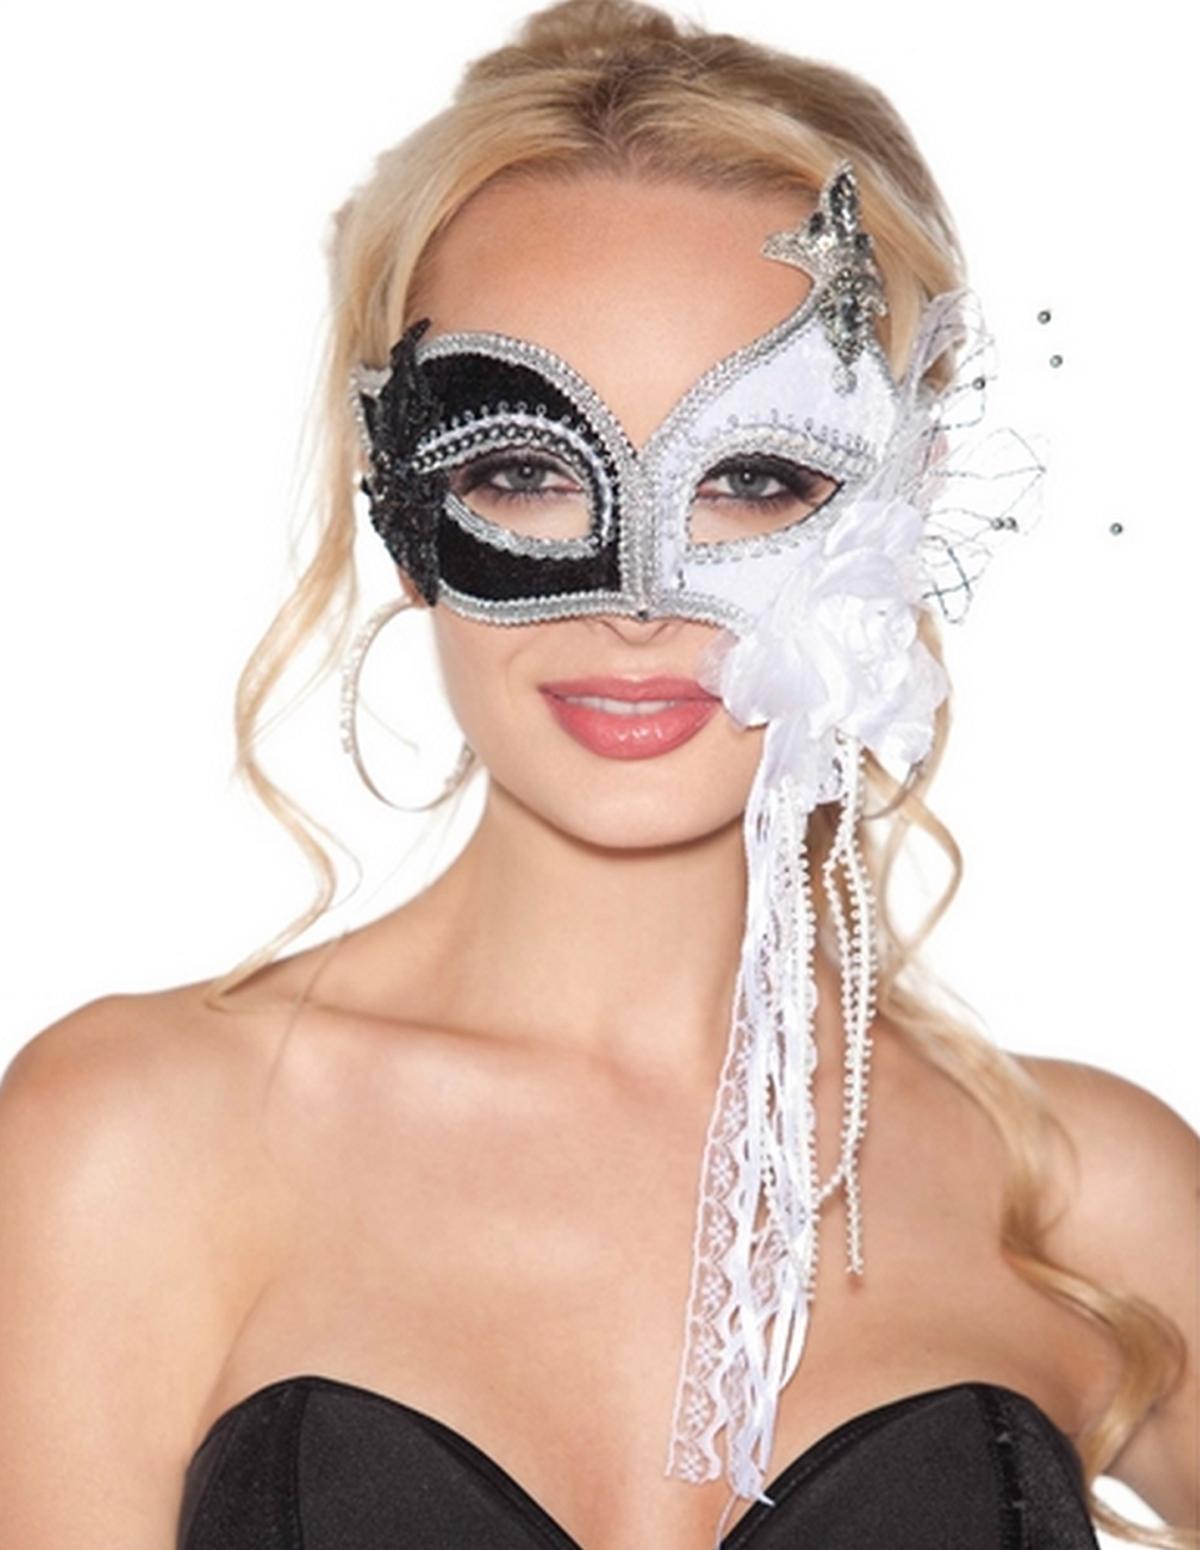 The Half Mask